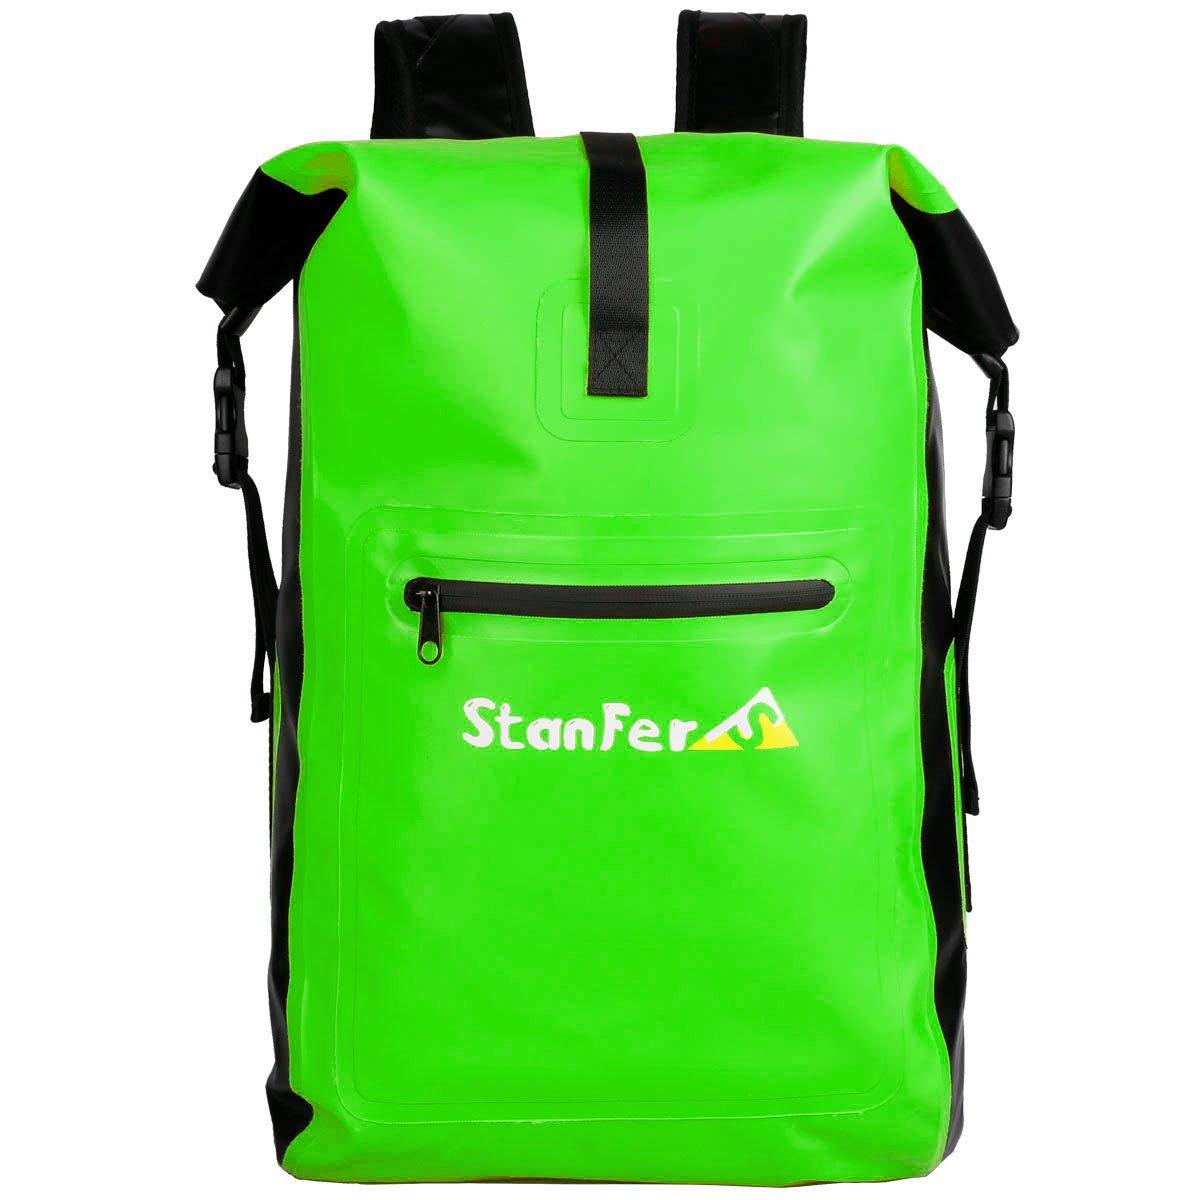 de78c6e8a6ce Luckroute Waterproof Dry Backpack- Fenix Toulouse Handball